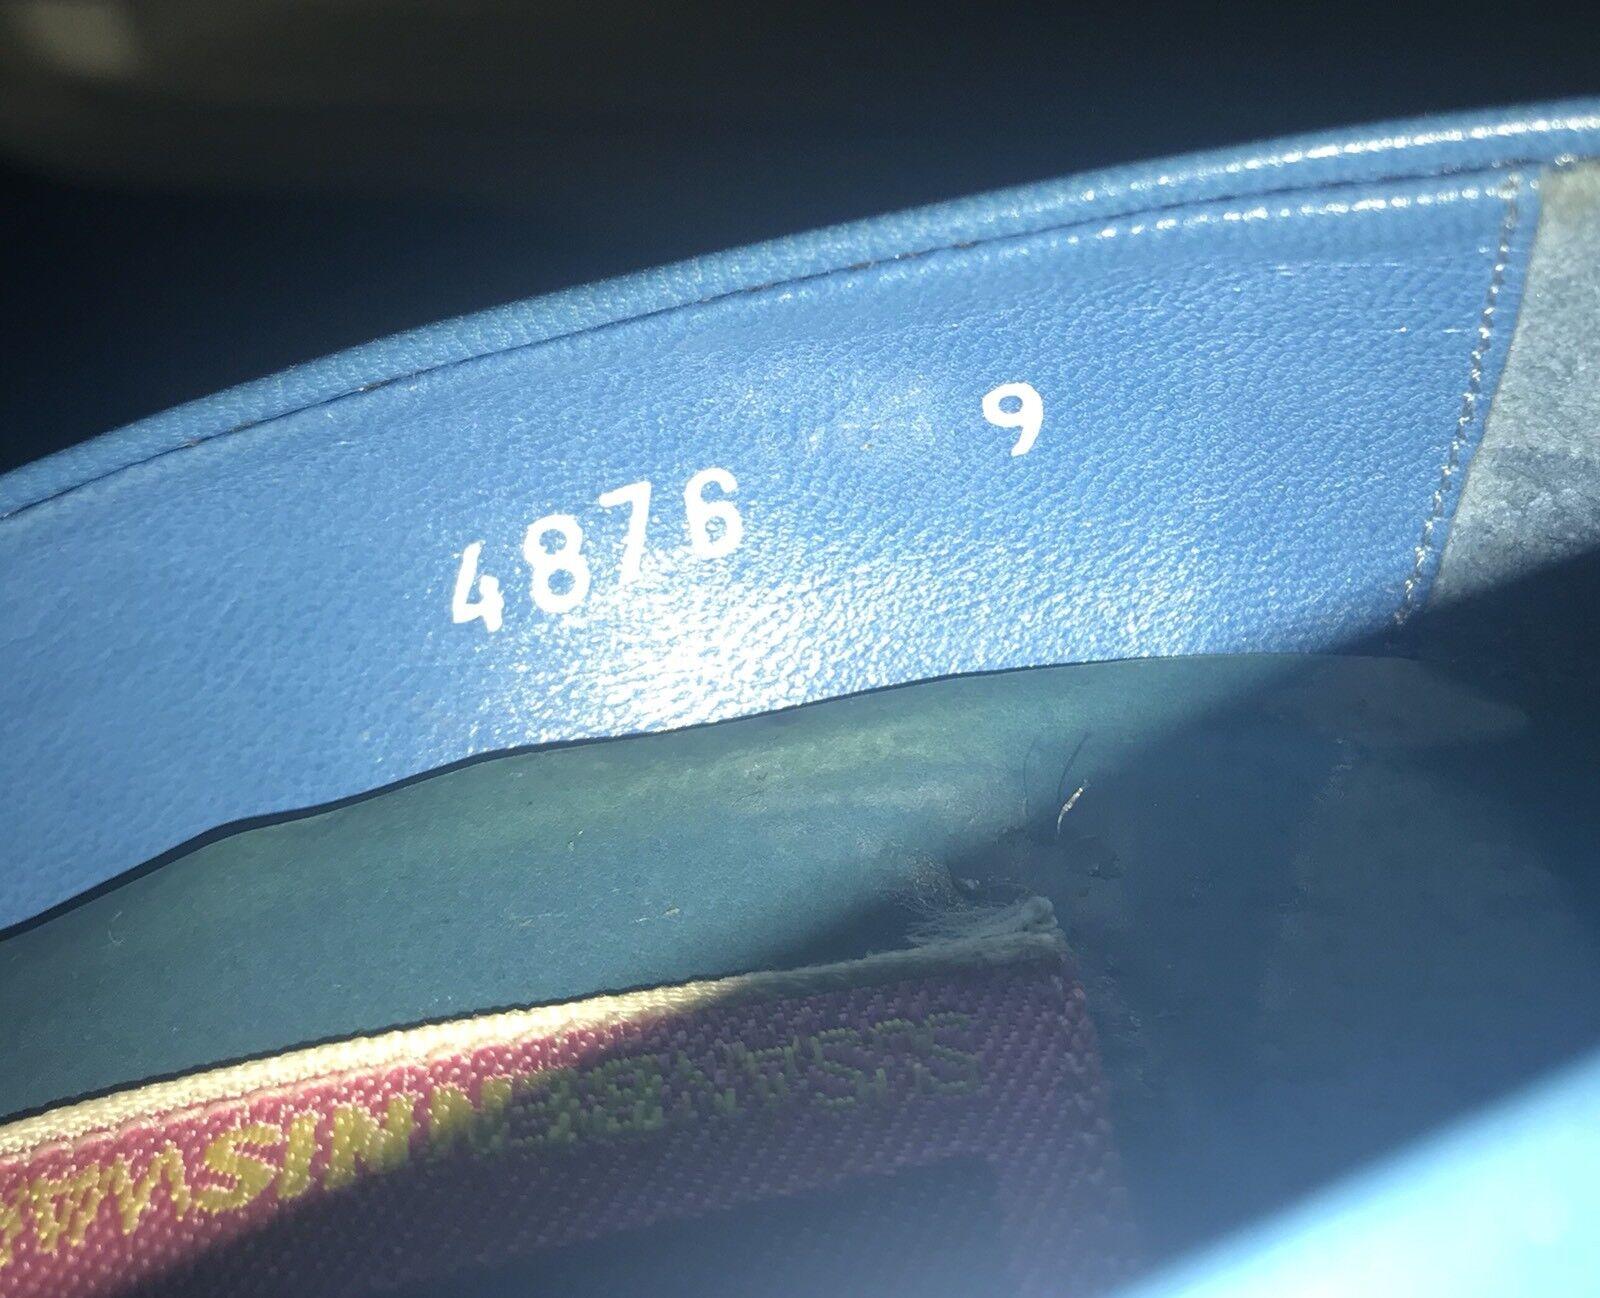 Susan Bennis Warren Edwards Blau Heels 9 9 9 B Original Owner Run Small f352c1